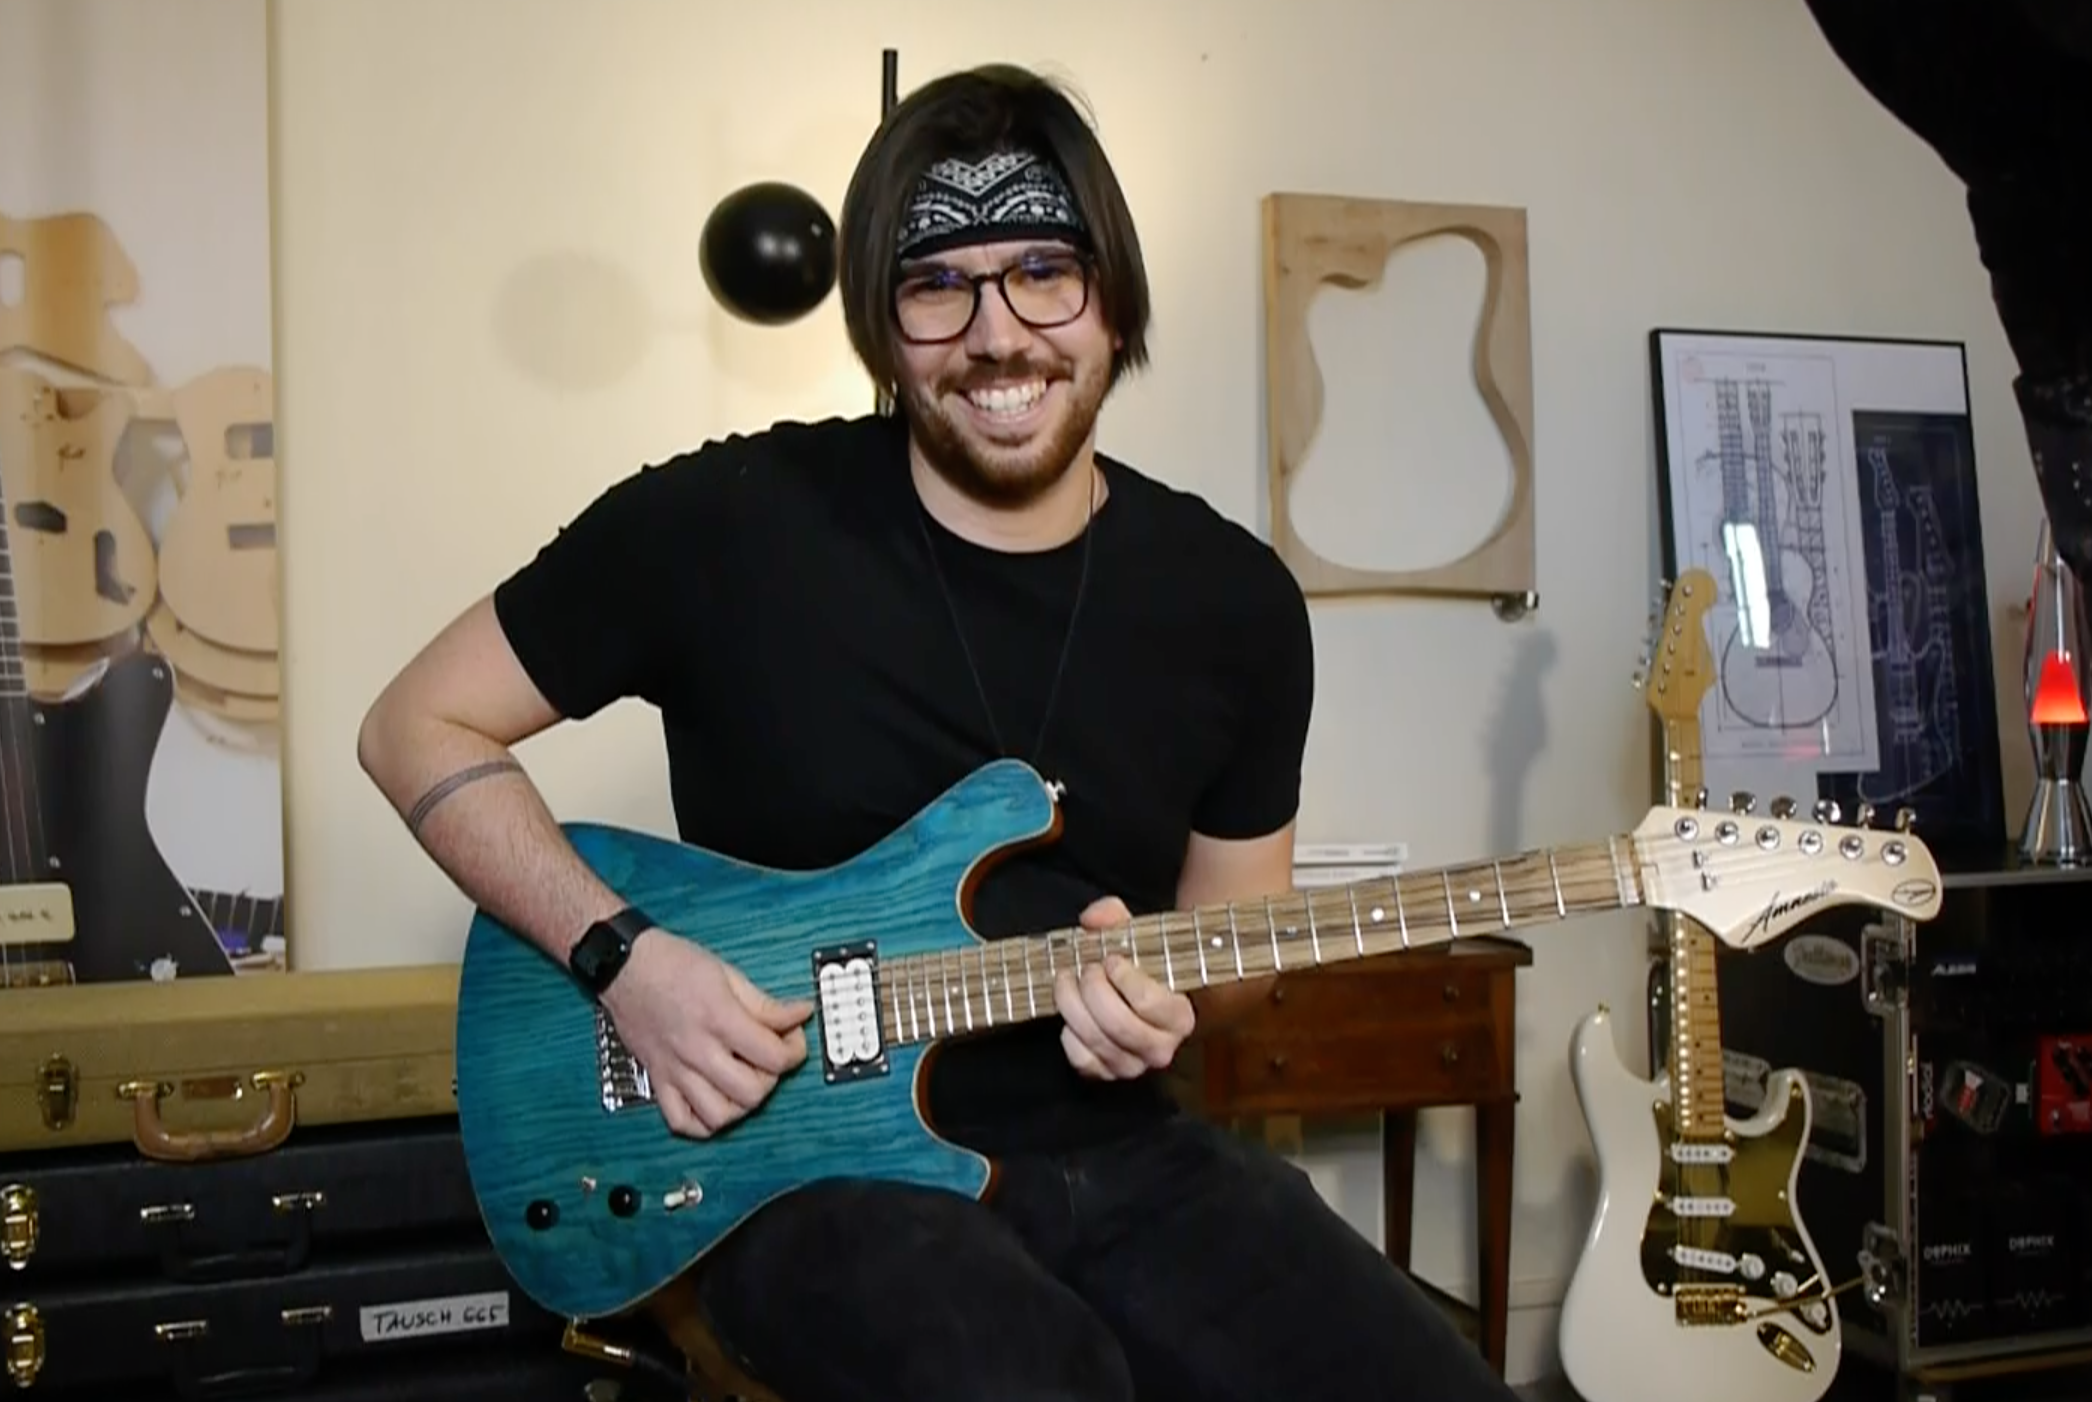 Tanguy Kerleroux interview express d'un guitariste instrumental sur Internet